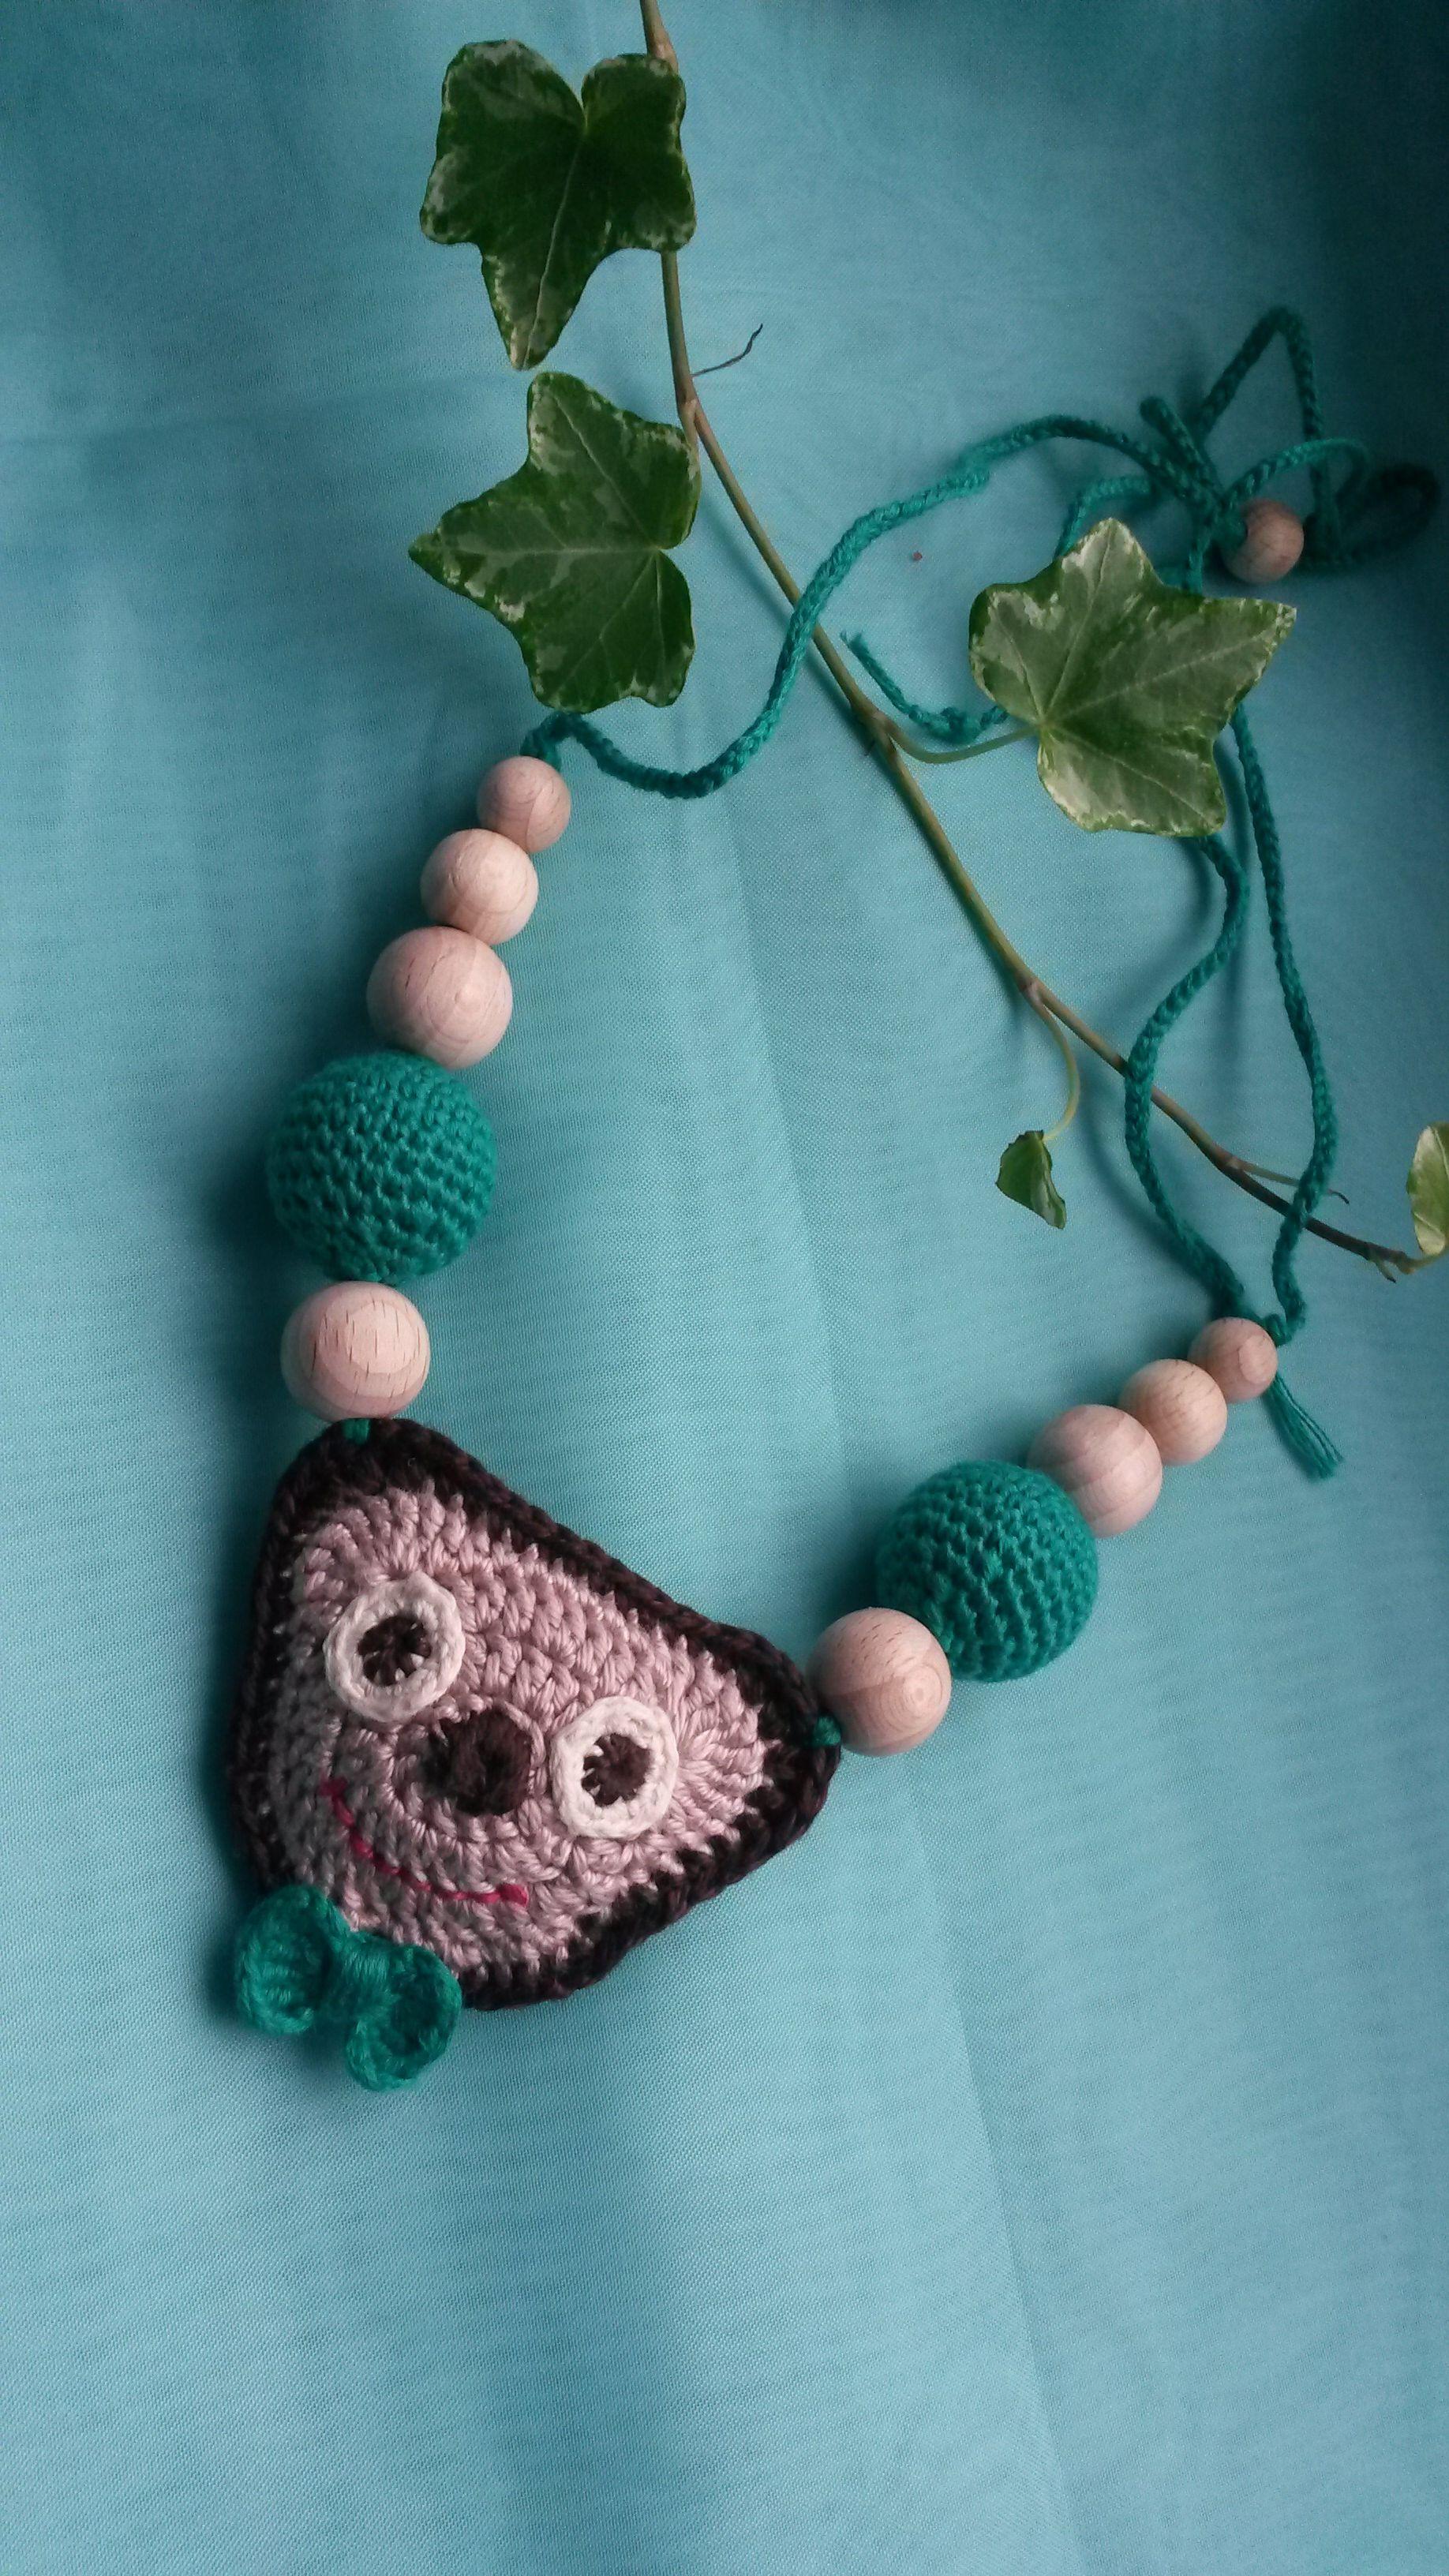 http://happybeads.shopmania.biz/cumpara/colier-teddy-bear-72